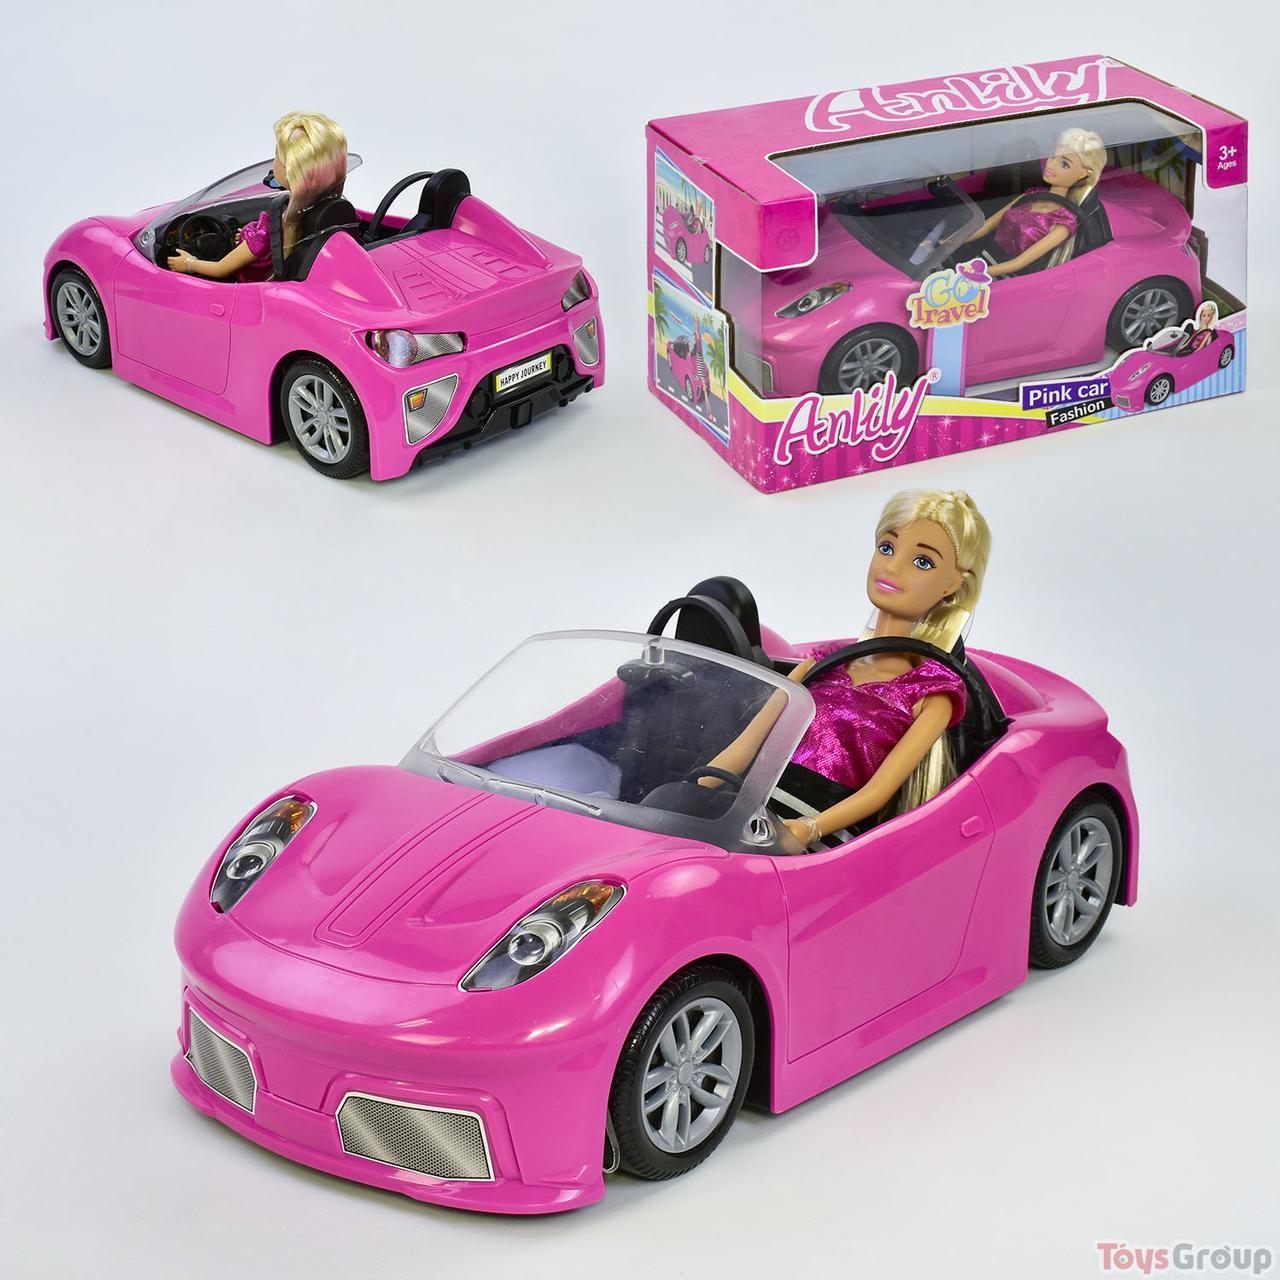 Кукла Anlily 99206 (12) с машиной